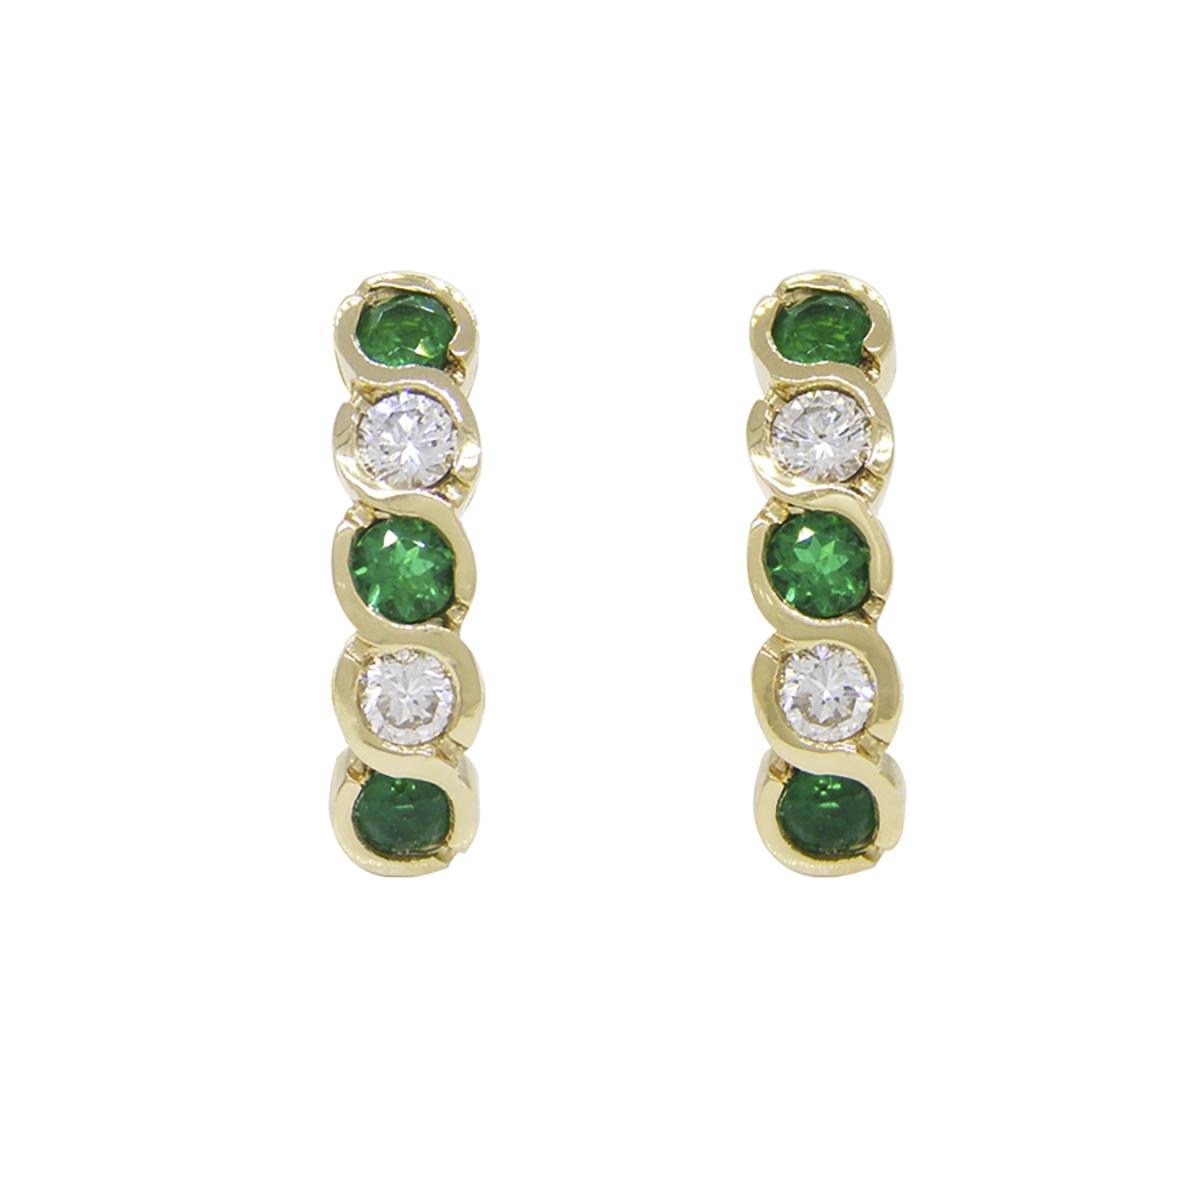 drop-emerald-and-diamond-earrings-in-18k-yellow-gold-clip-backs